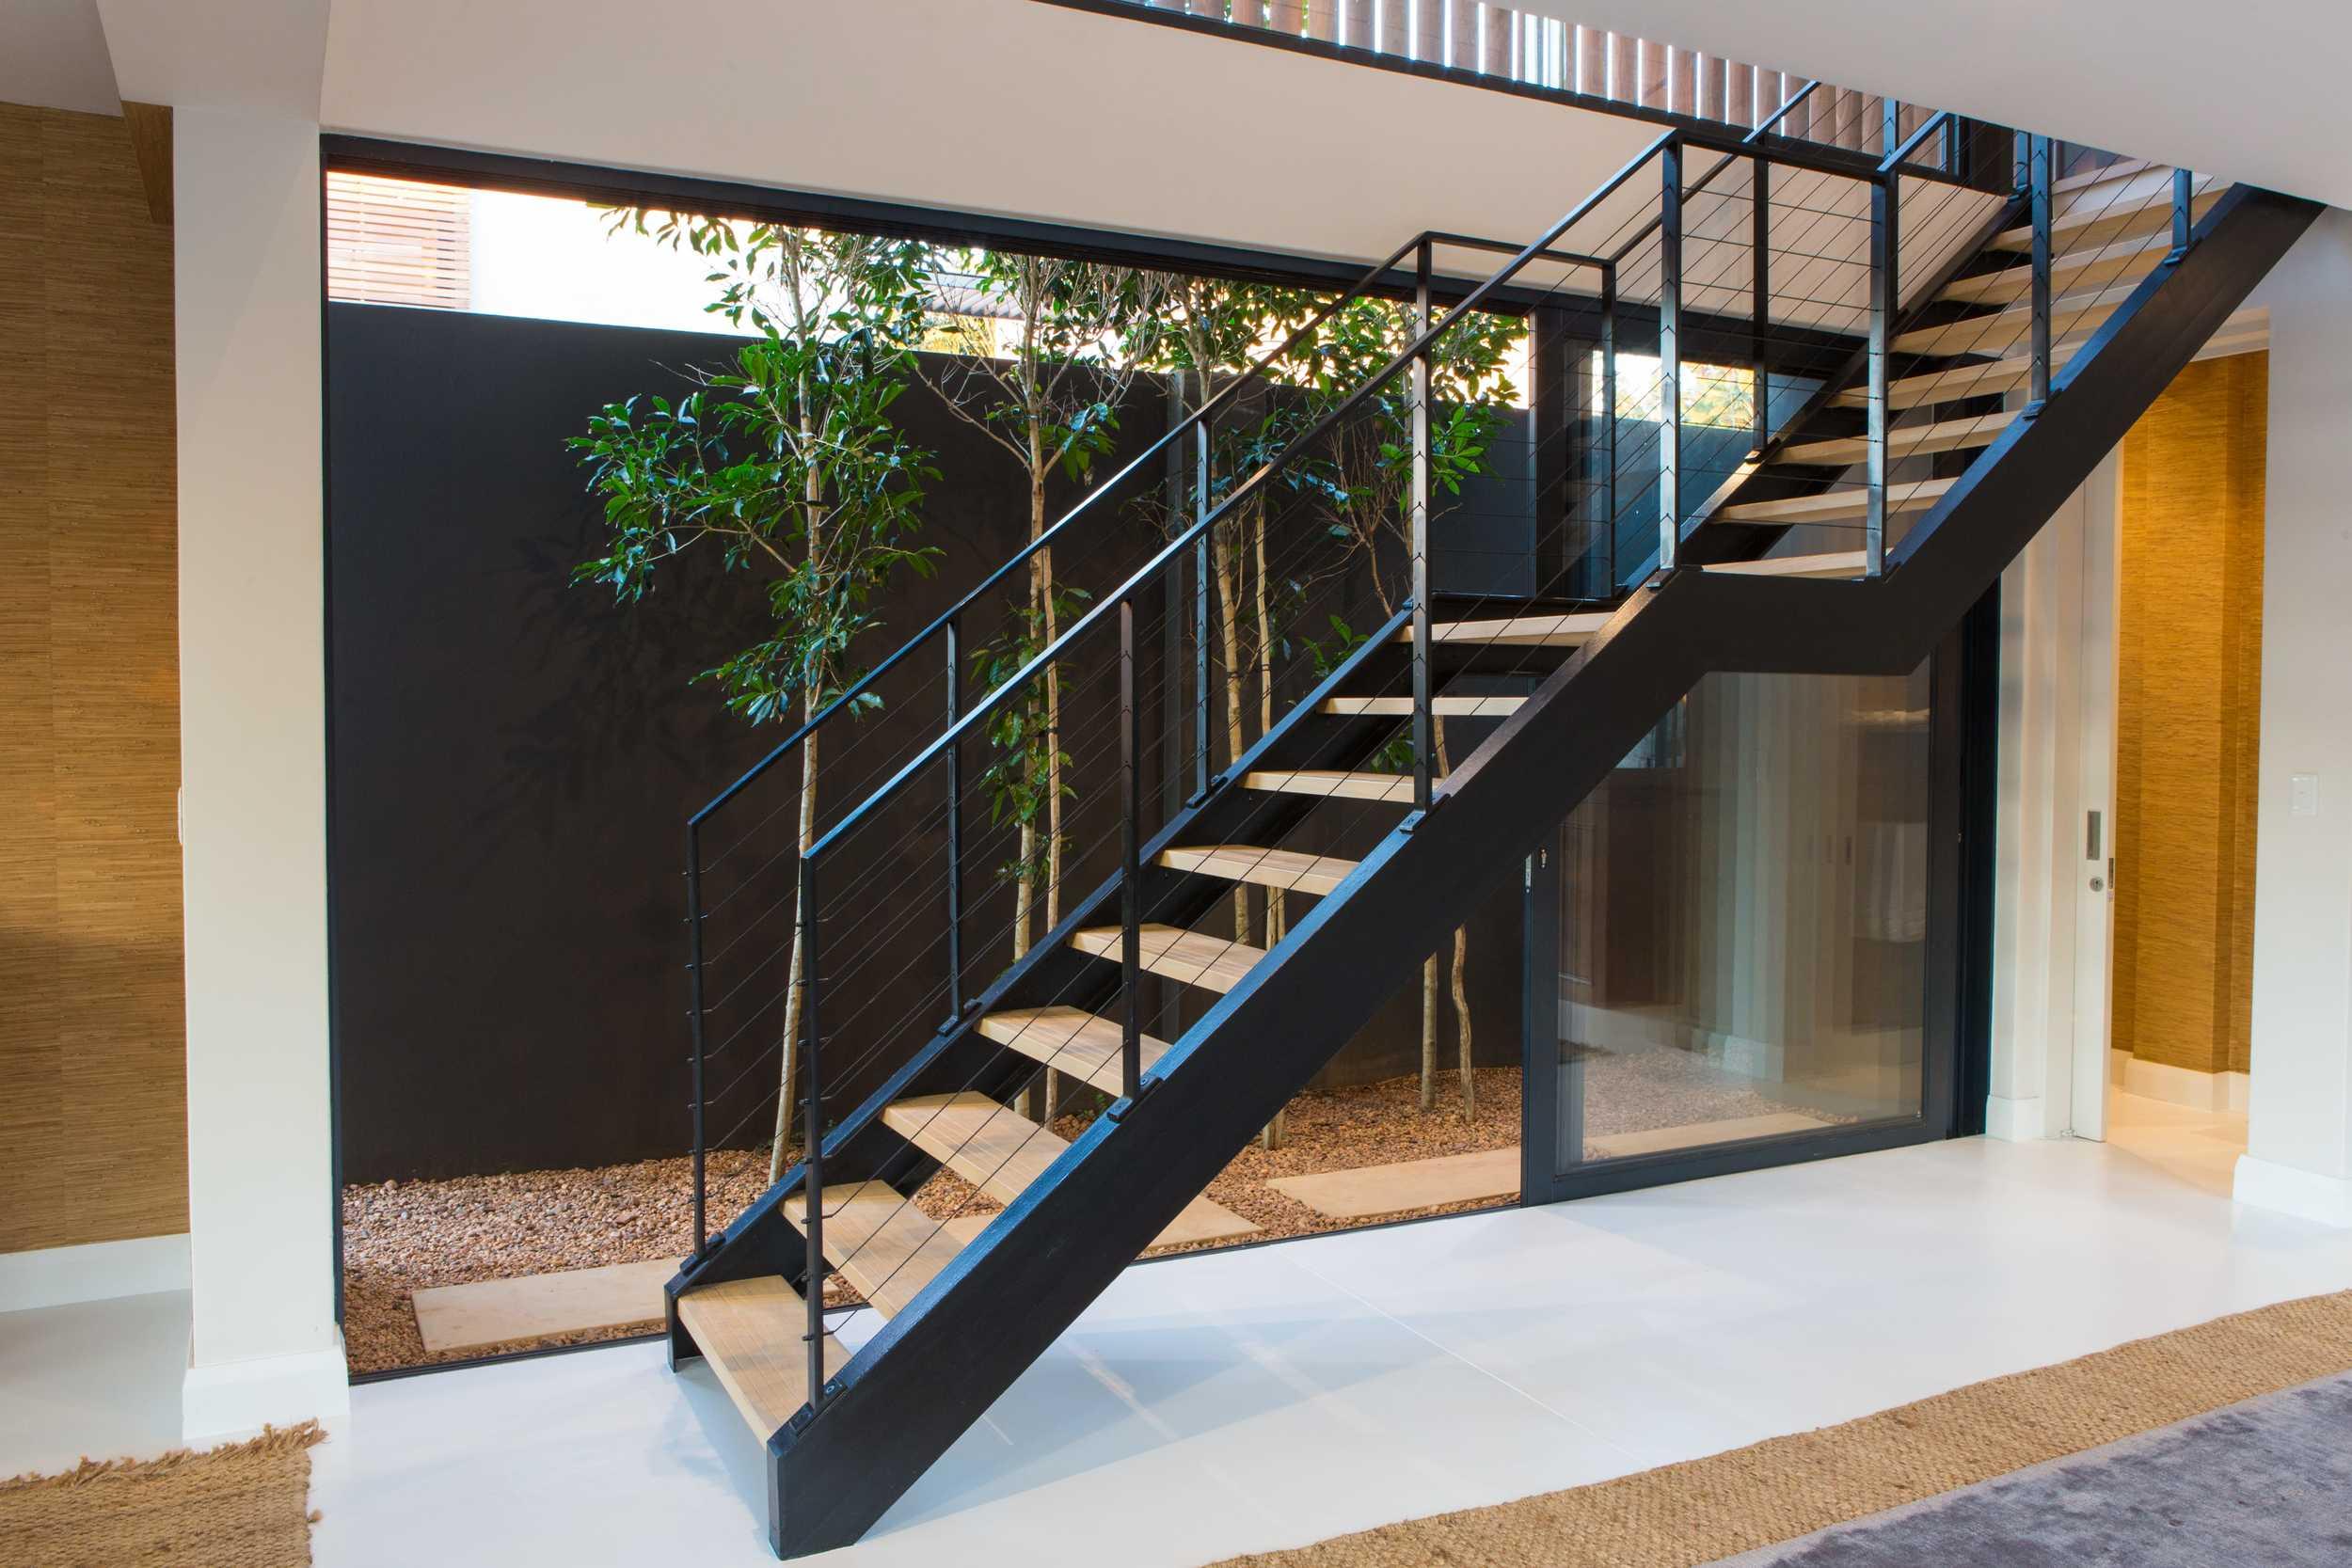 julia-rutherfoord-architect-dunkirk-estate-2015-06.jpg